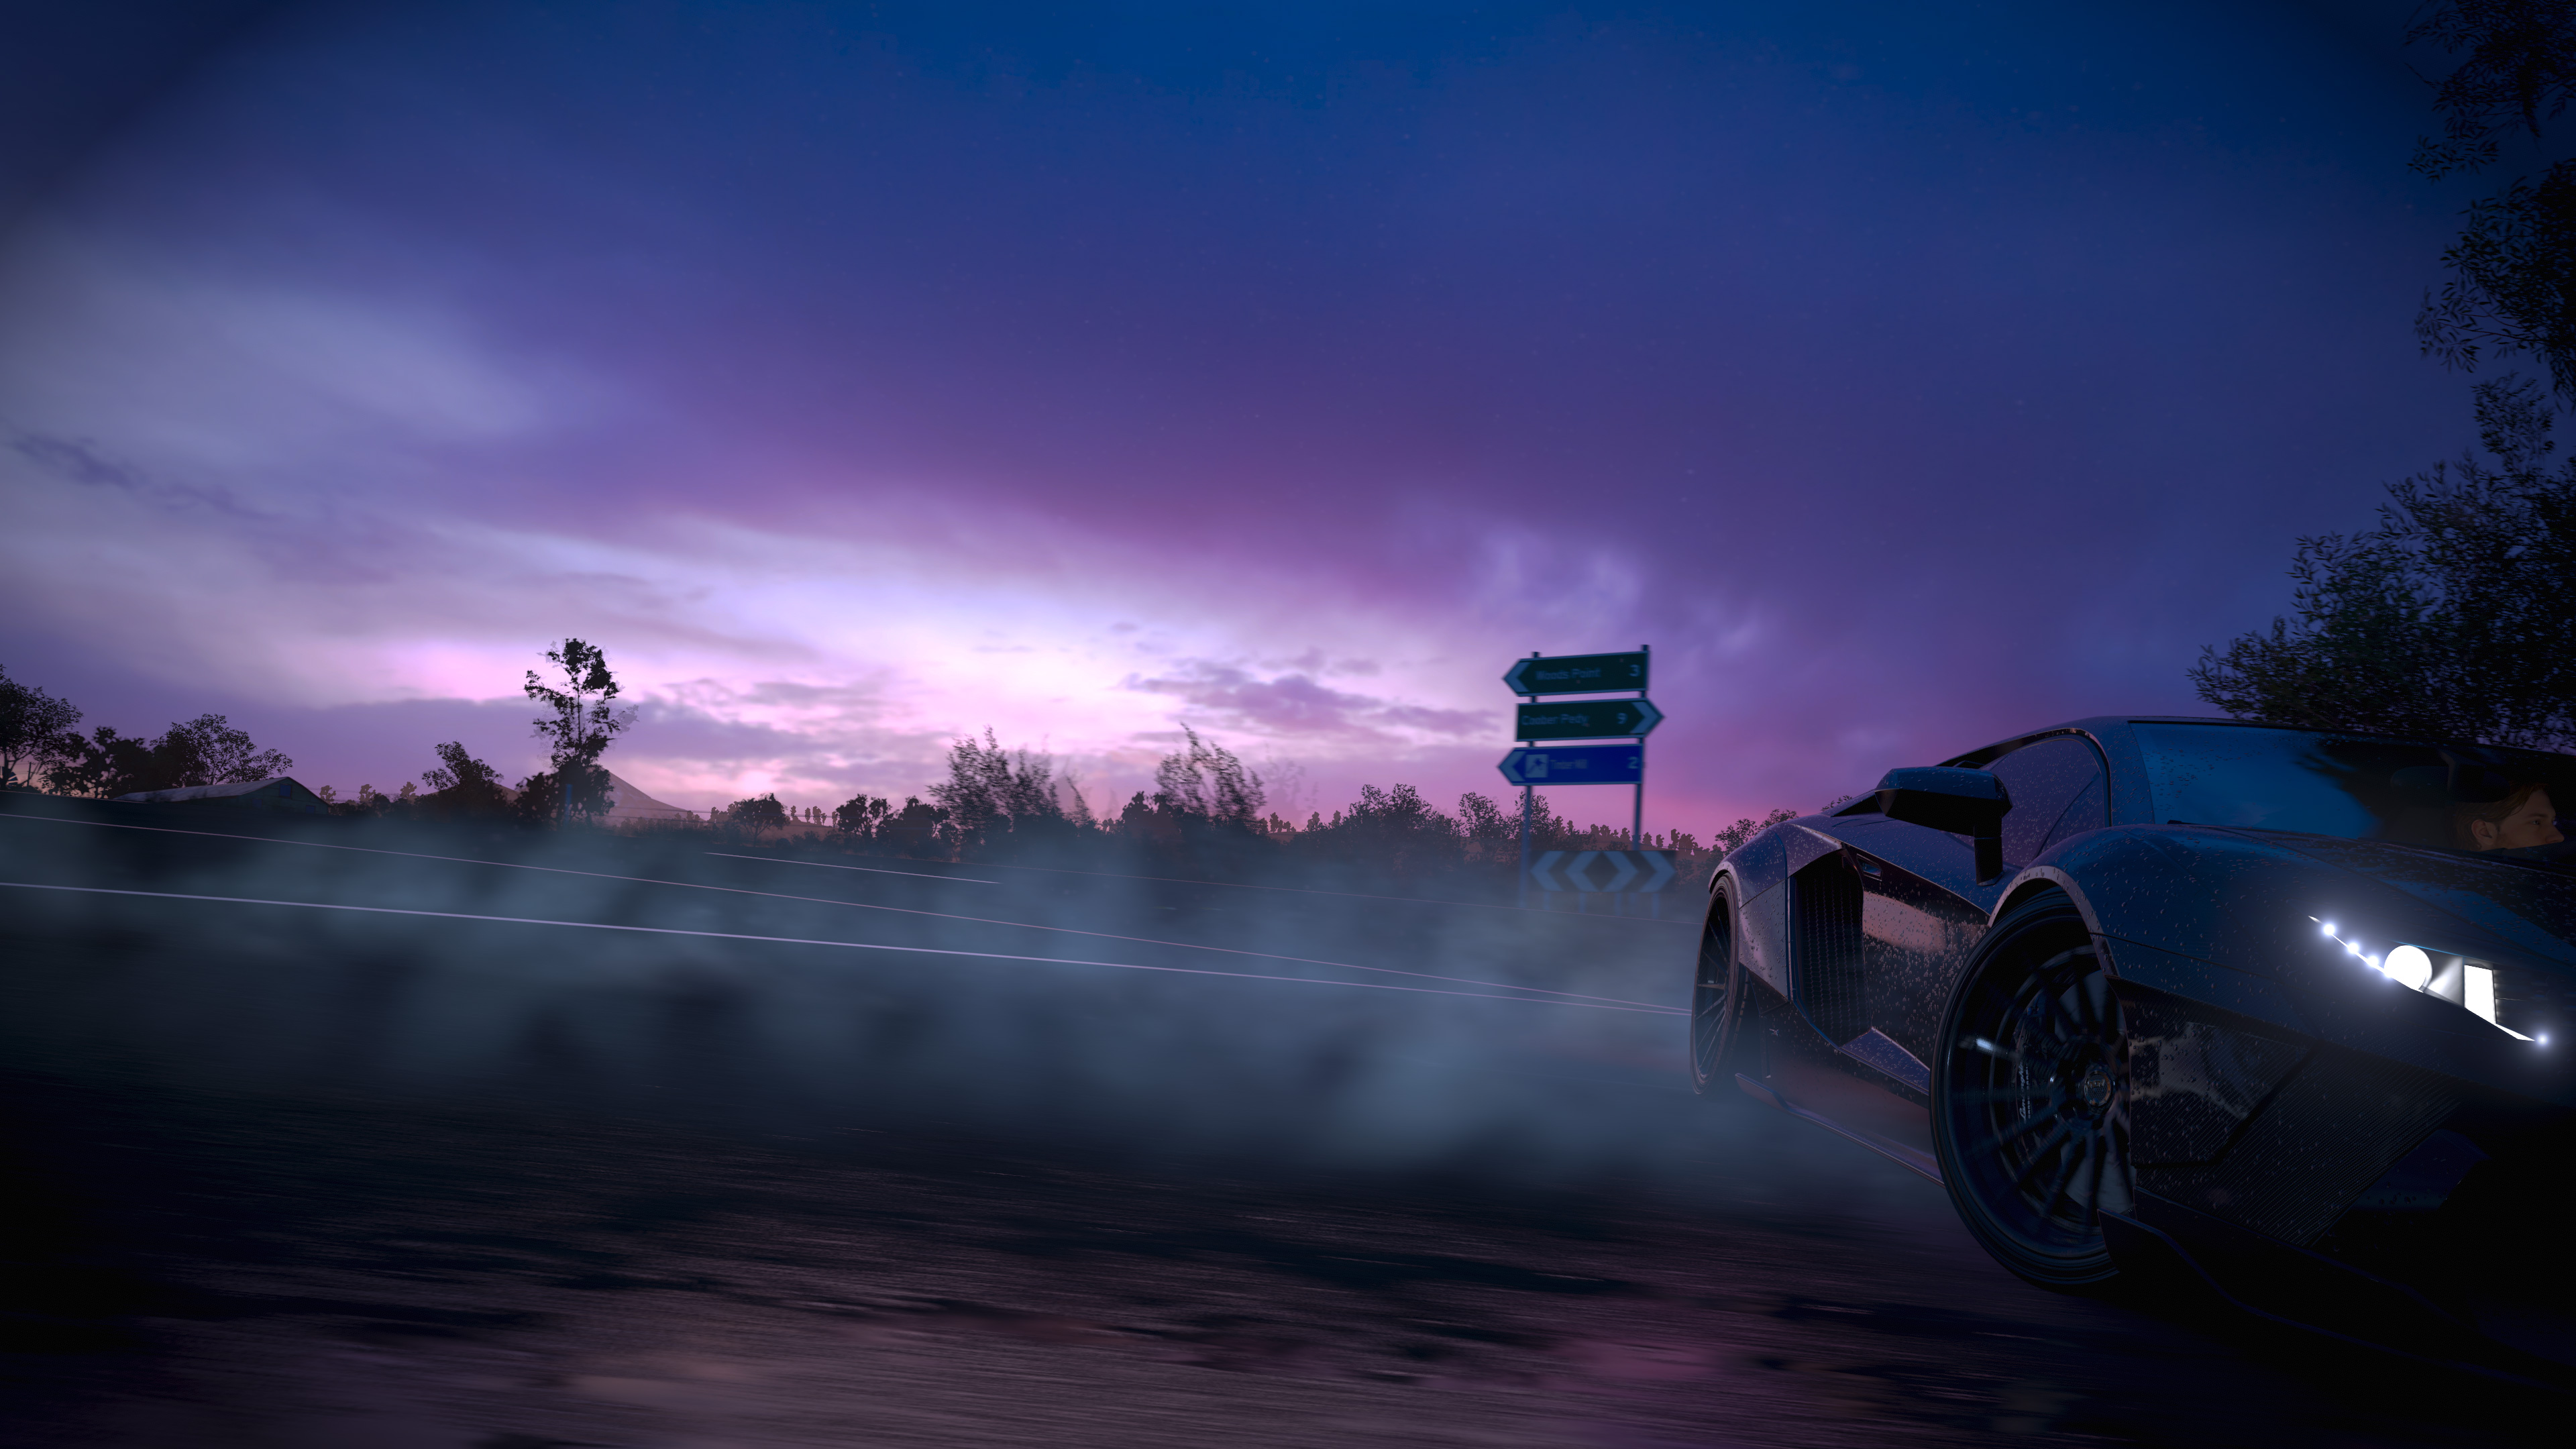 Forza Horizon 3 4k Lamborghini Aventador, HD Games, 4k